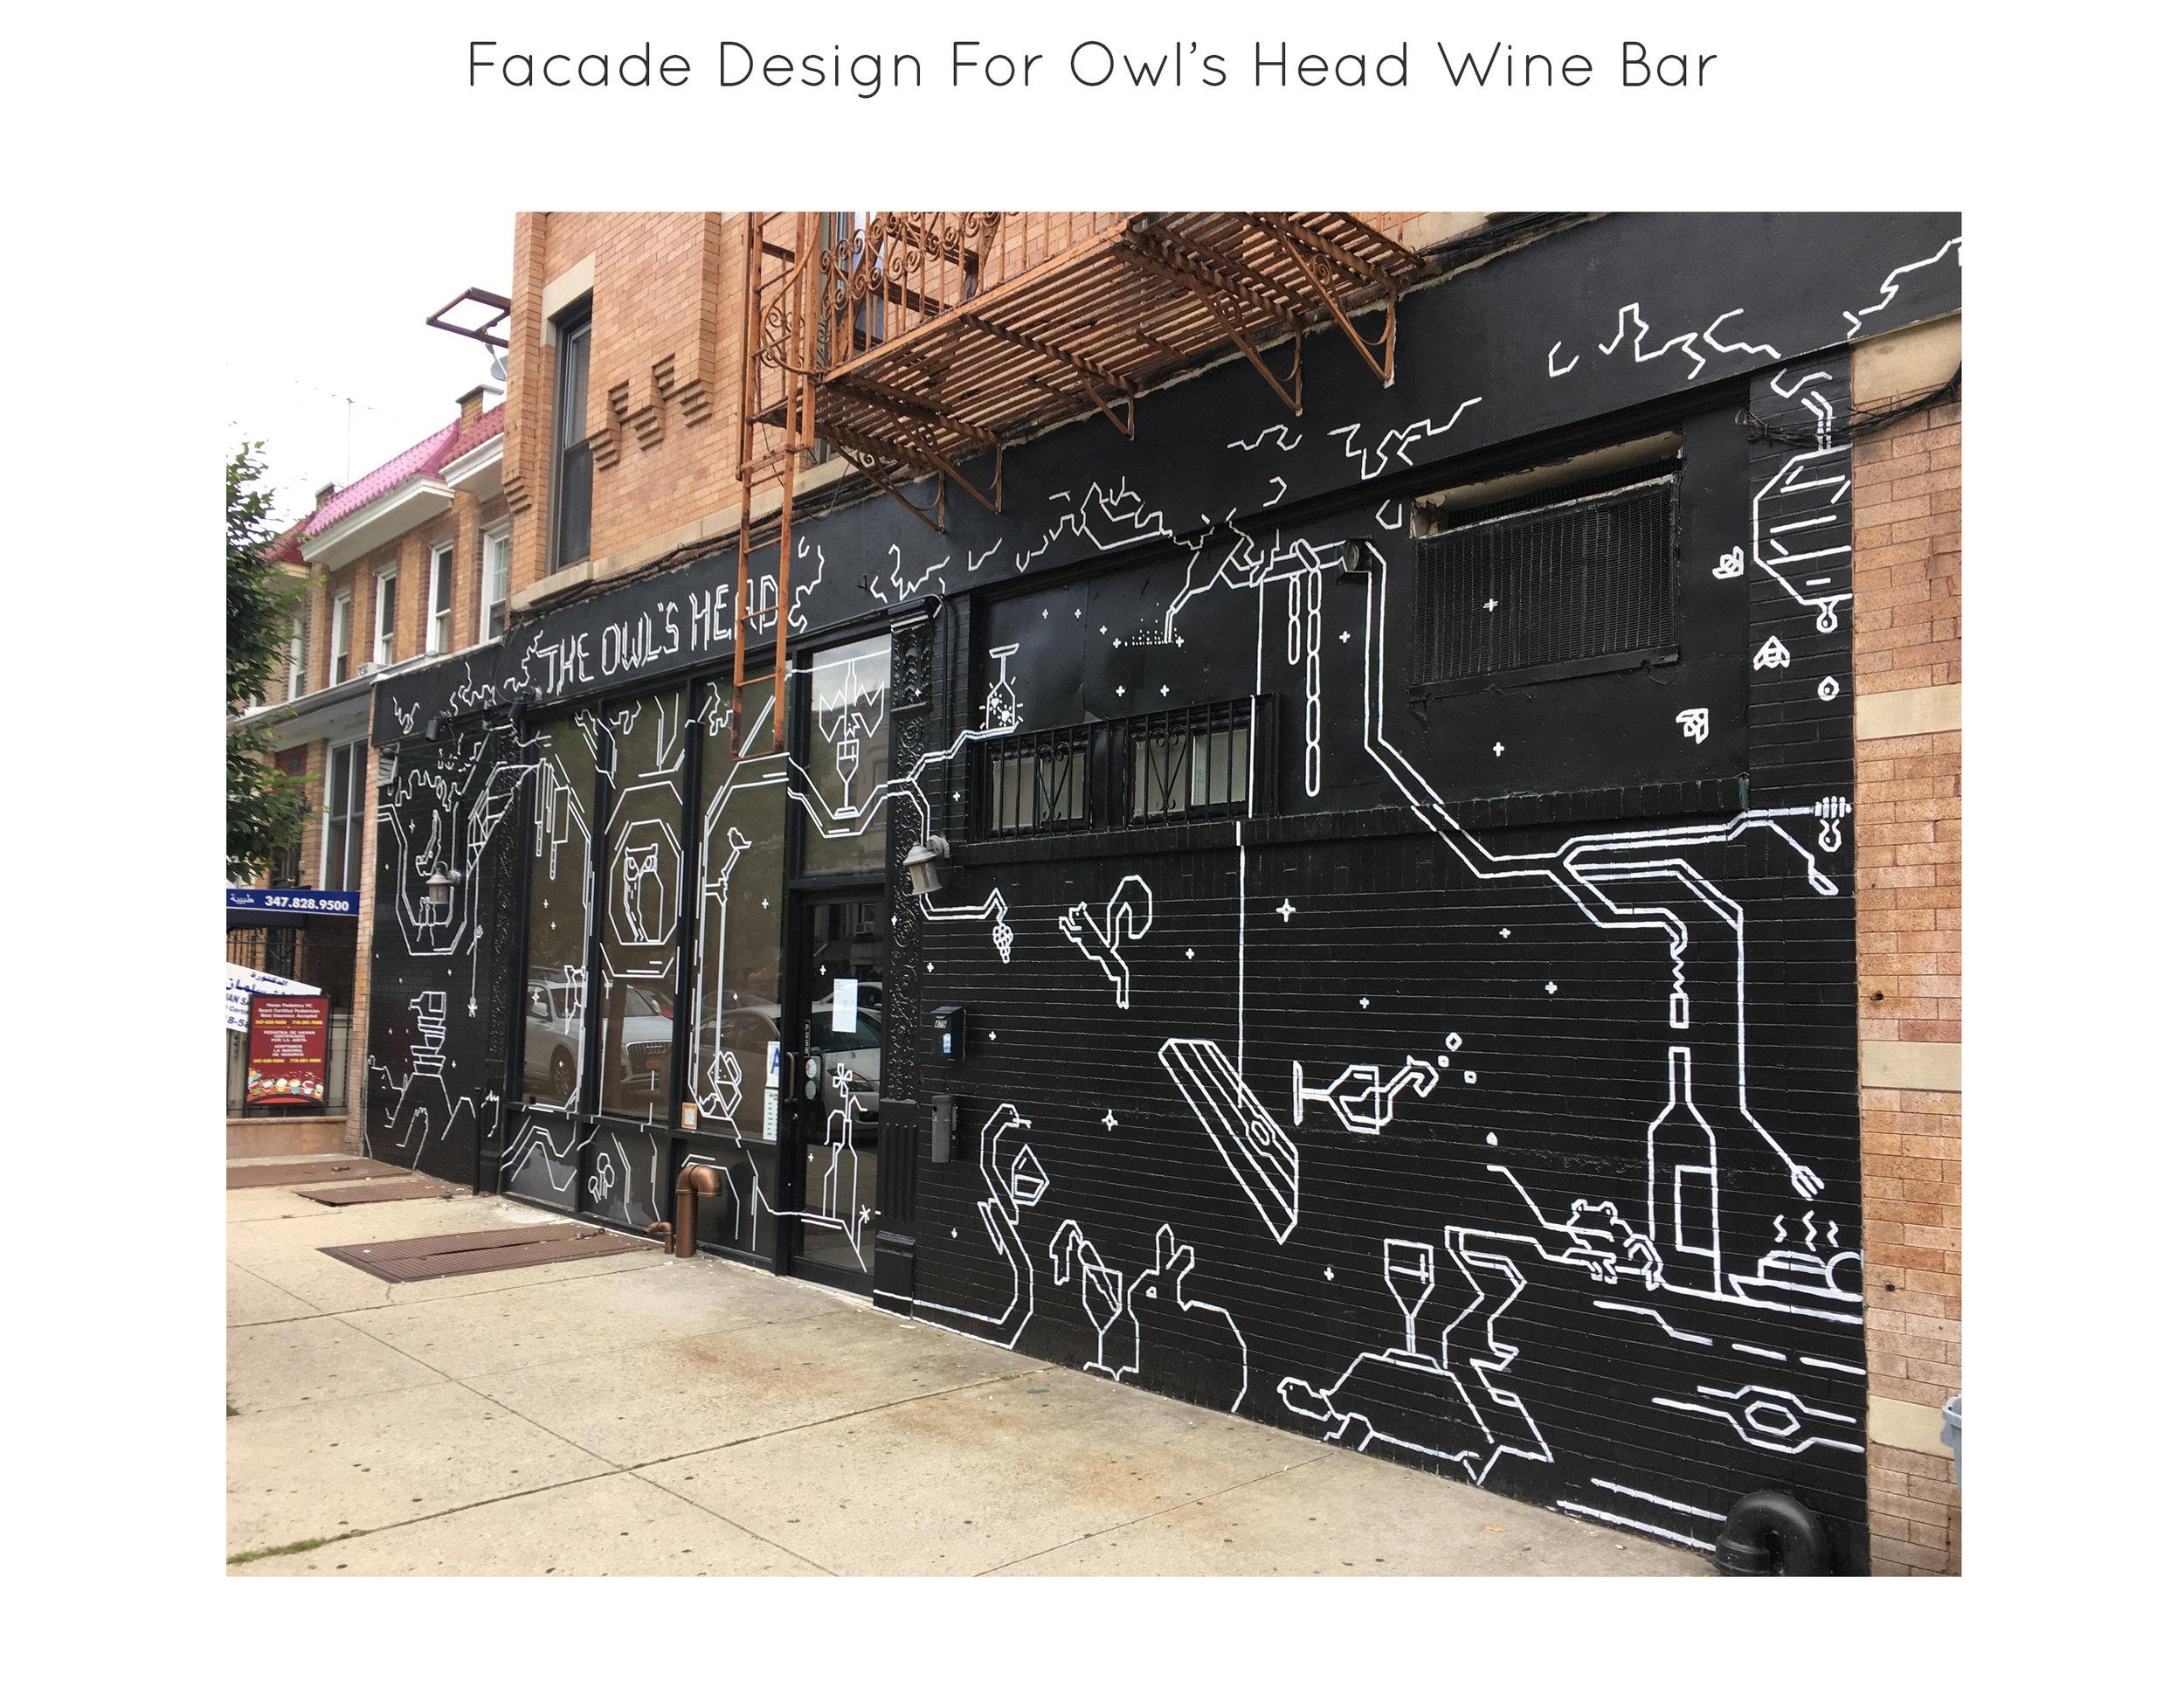 Facade Design for  Owl's Head Wine Bar , Brooklyn, NY.